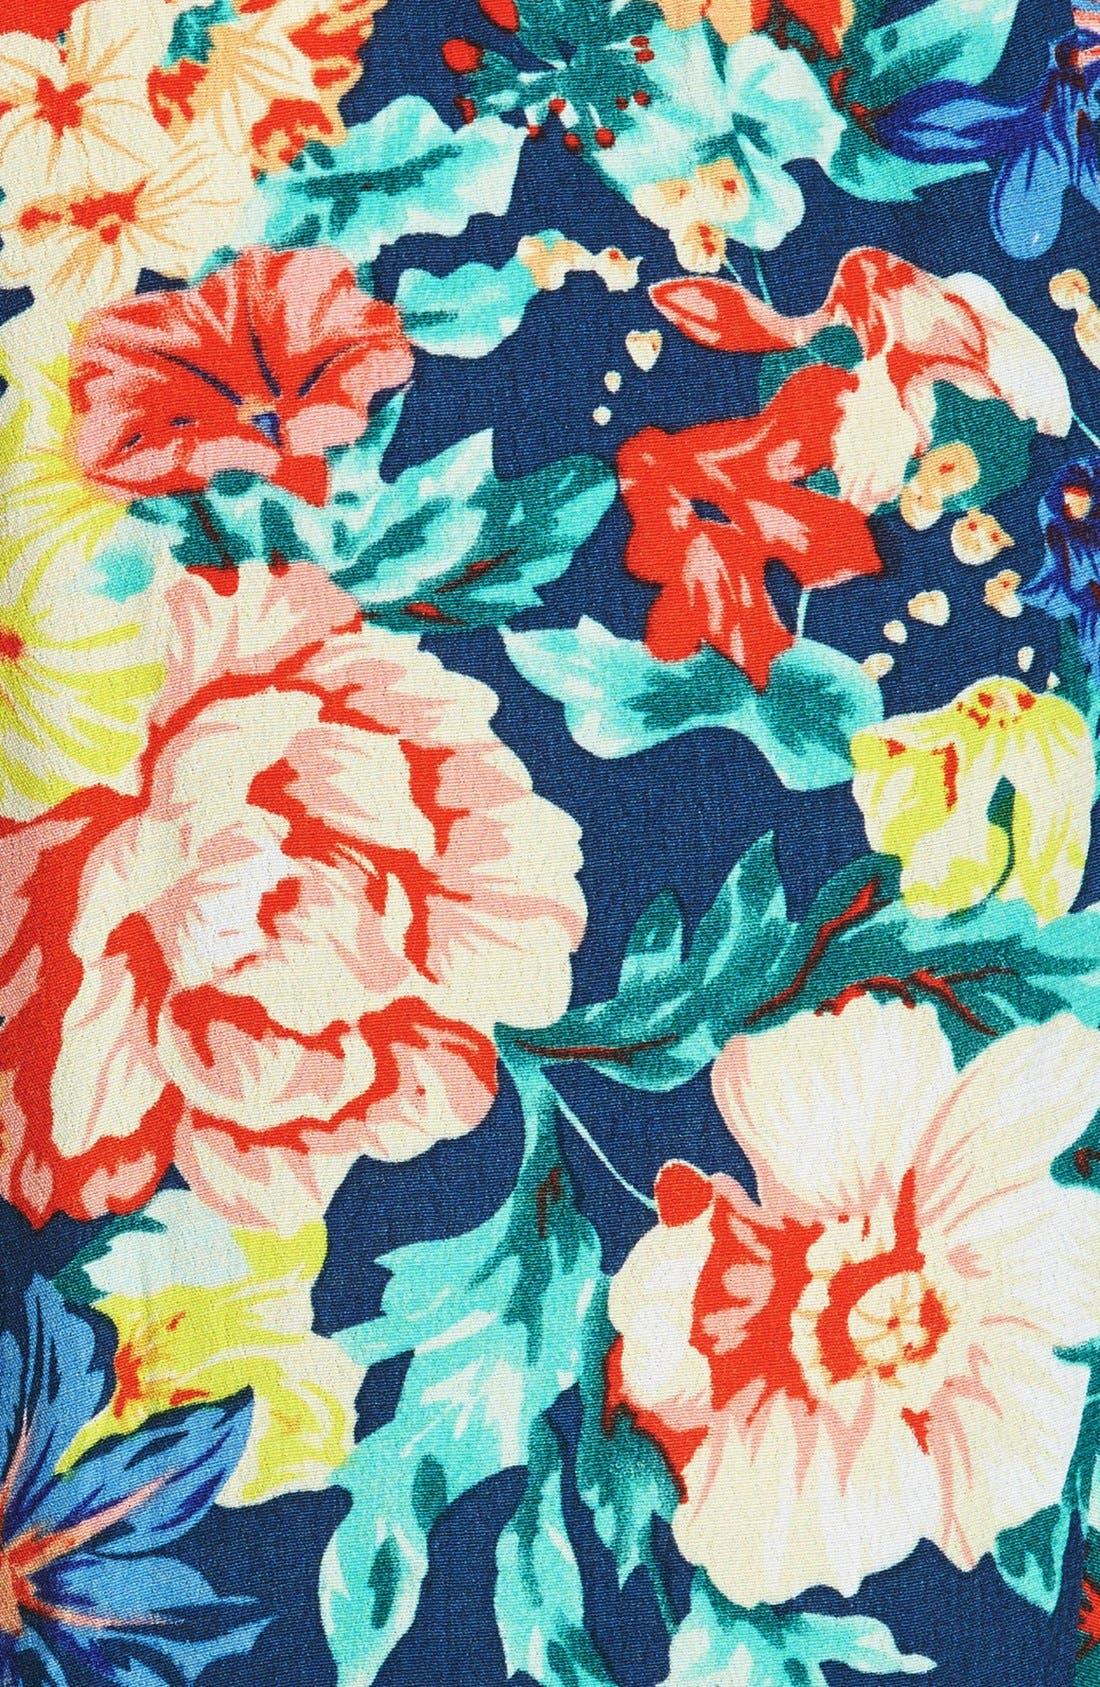 'Acid Bloom' Floral Print Jogger Pants,                             Alternate thumbnail 4, color,                             400